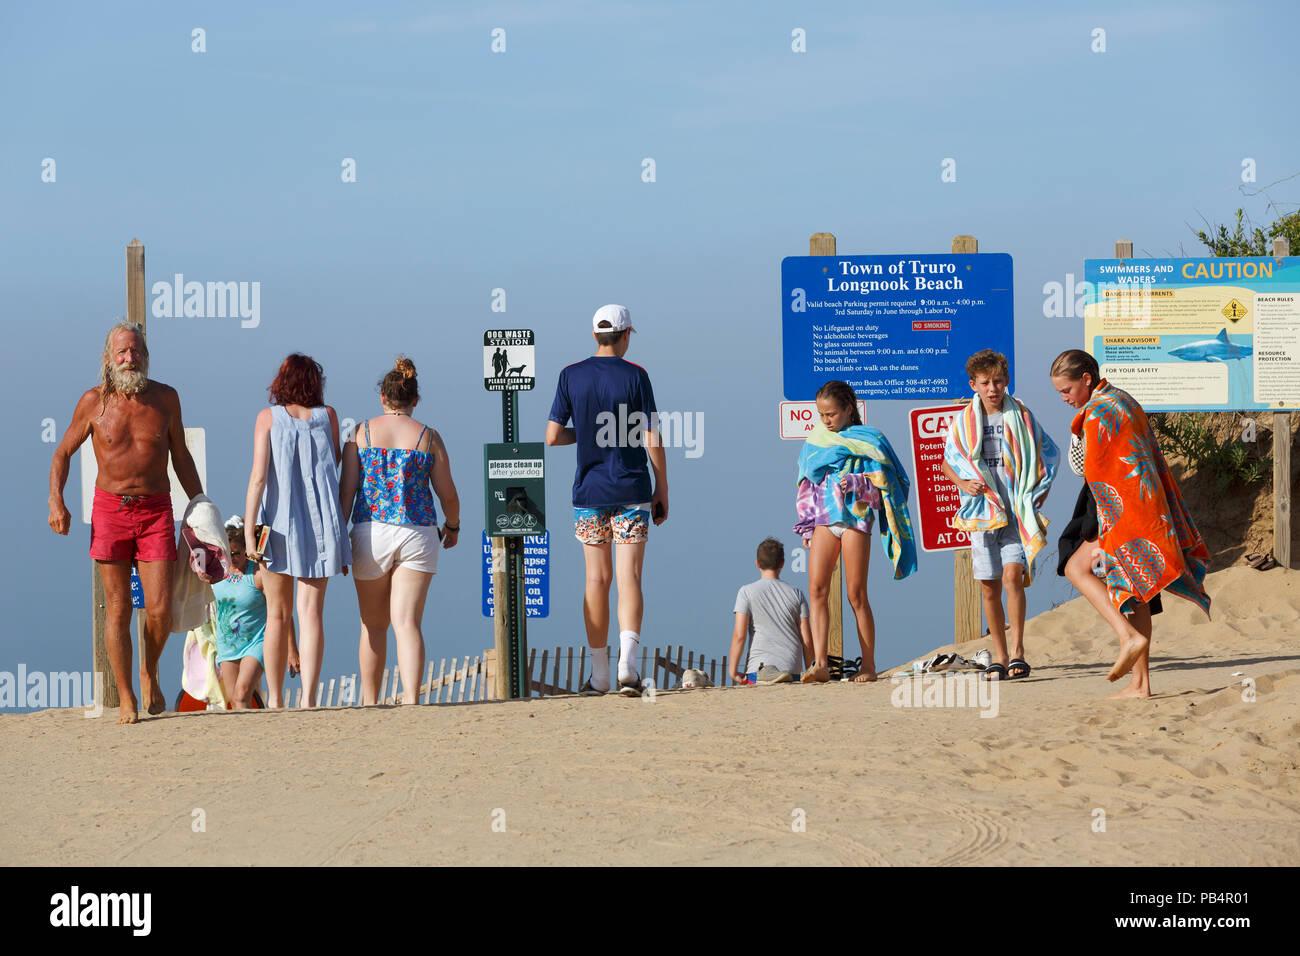 Cape Cod National Seashore, ,Longnook Beach, Truro, Massachusetts - Stock Image